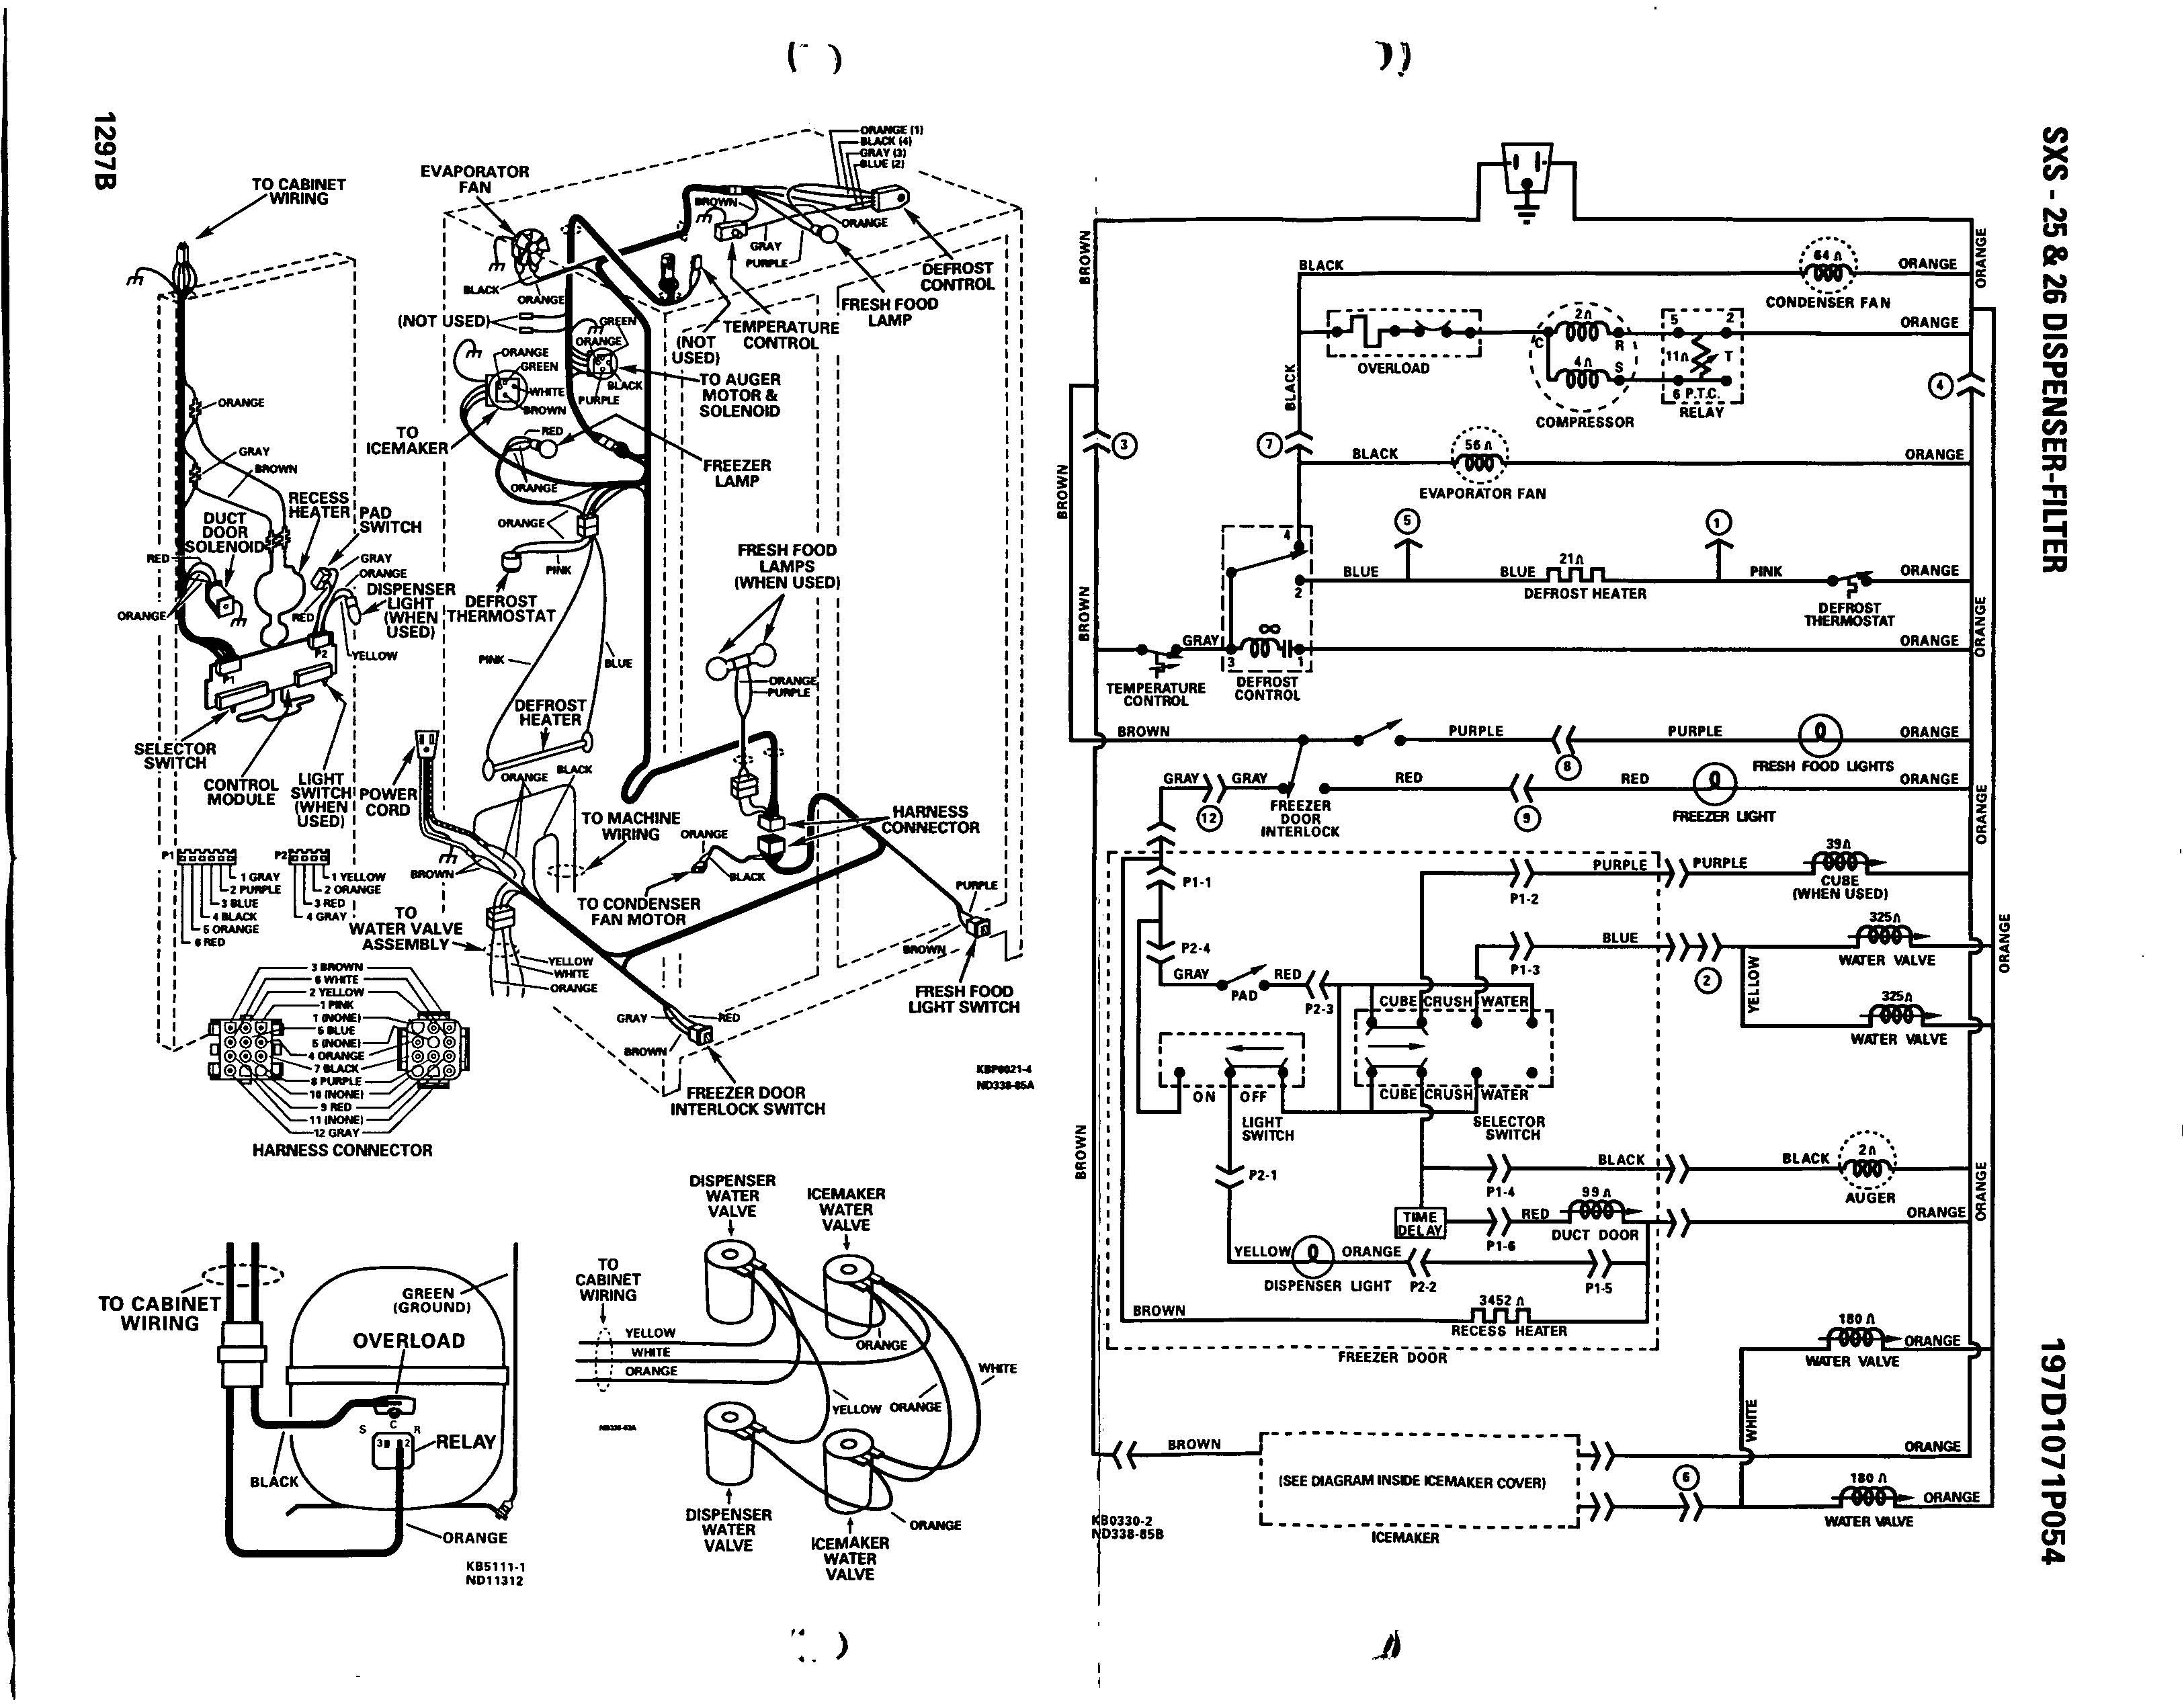 Wiring Diagram Ge Profile Simple Guide About Kia Venga Refrigerator 1967 Rh David Huggett Co Uk